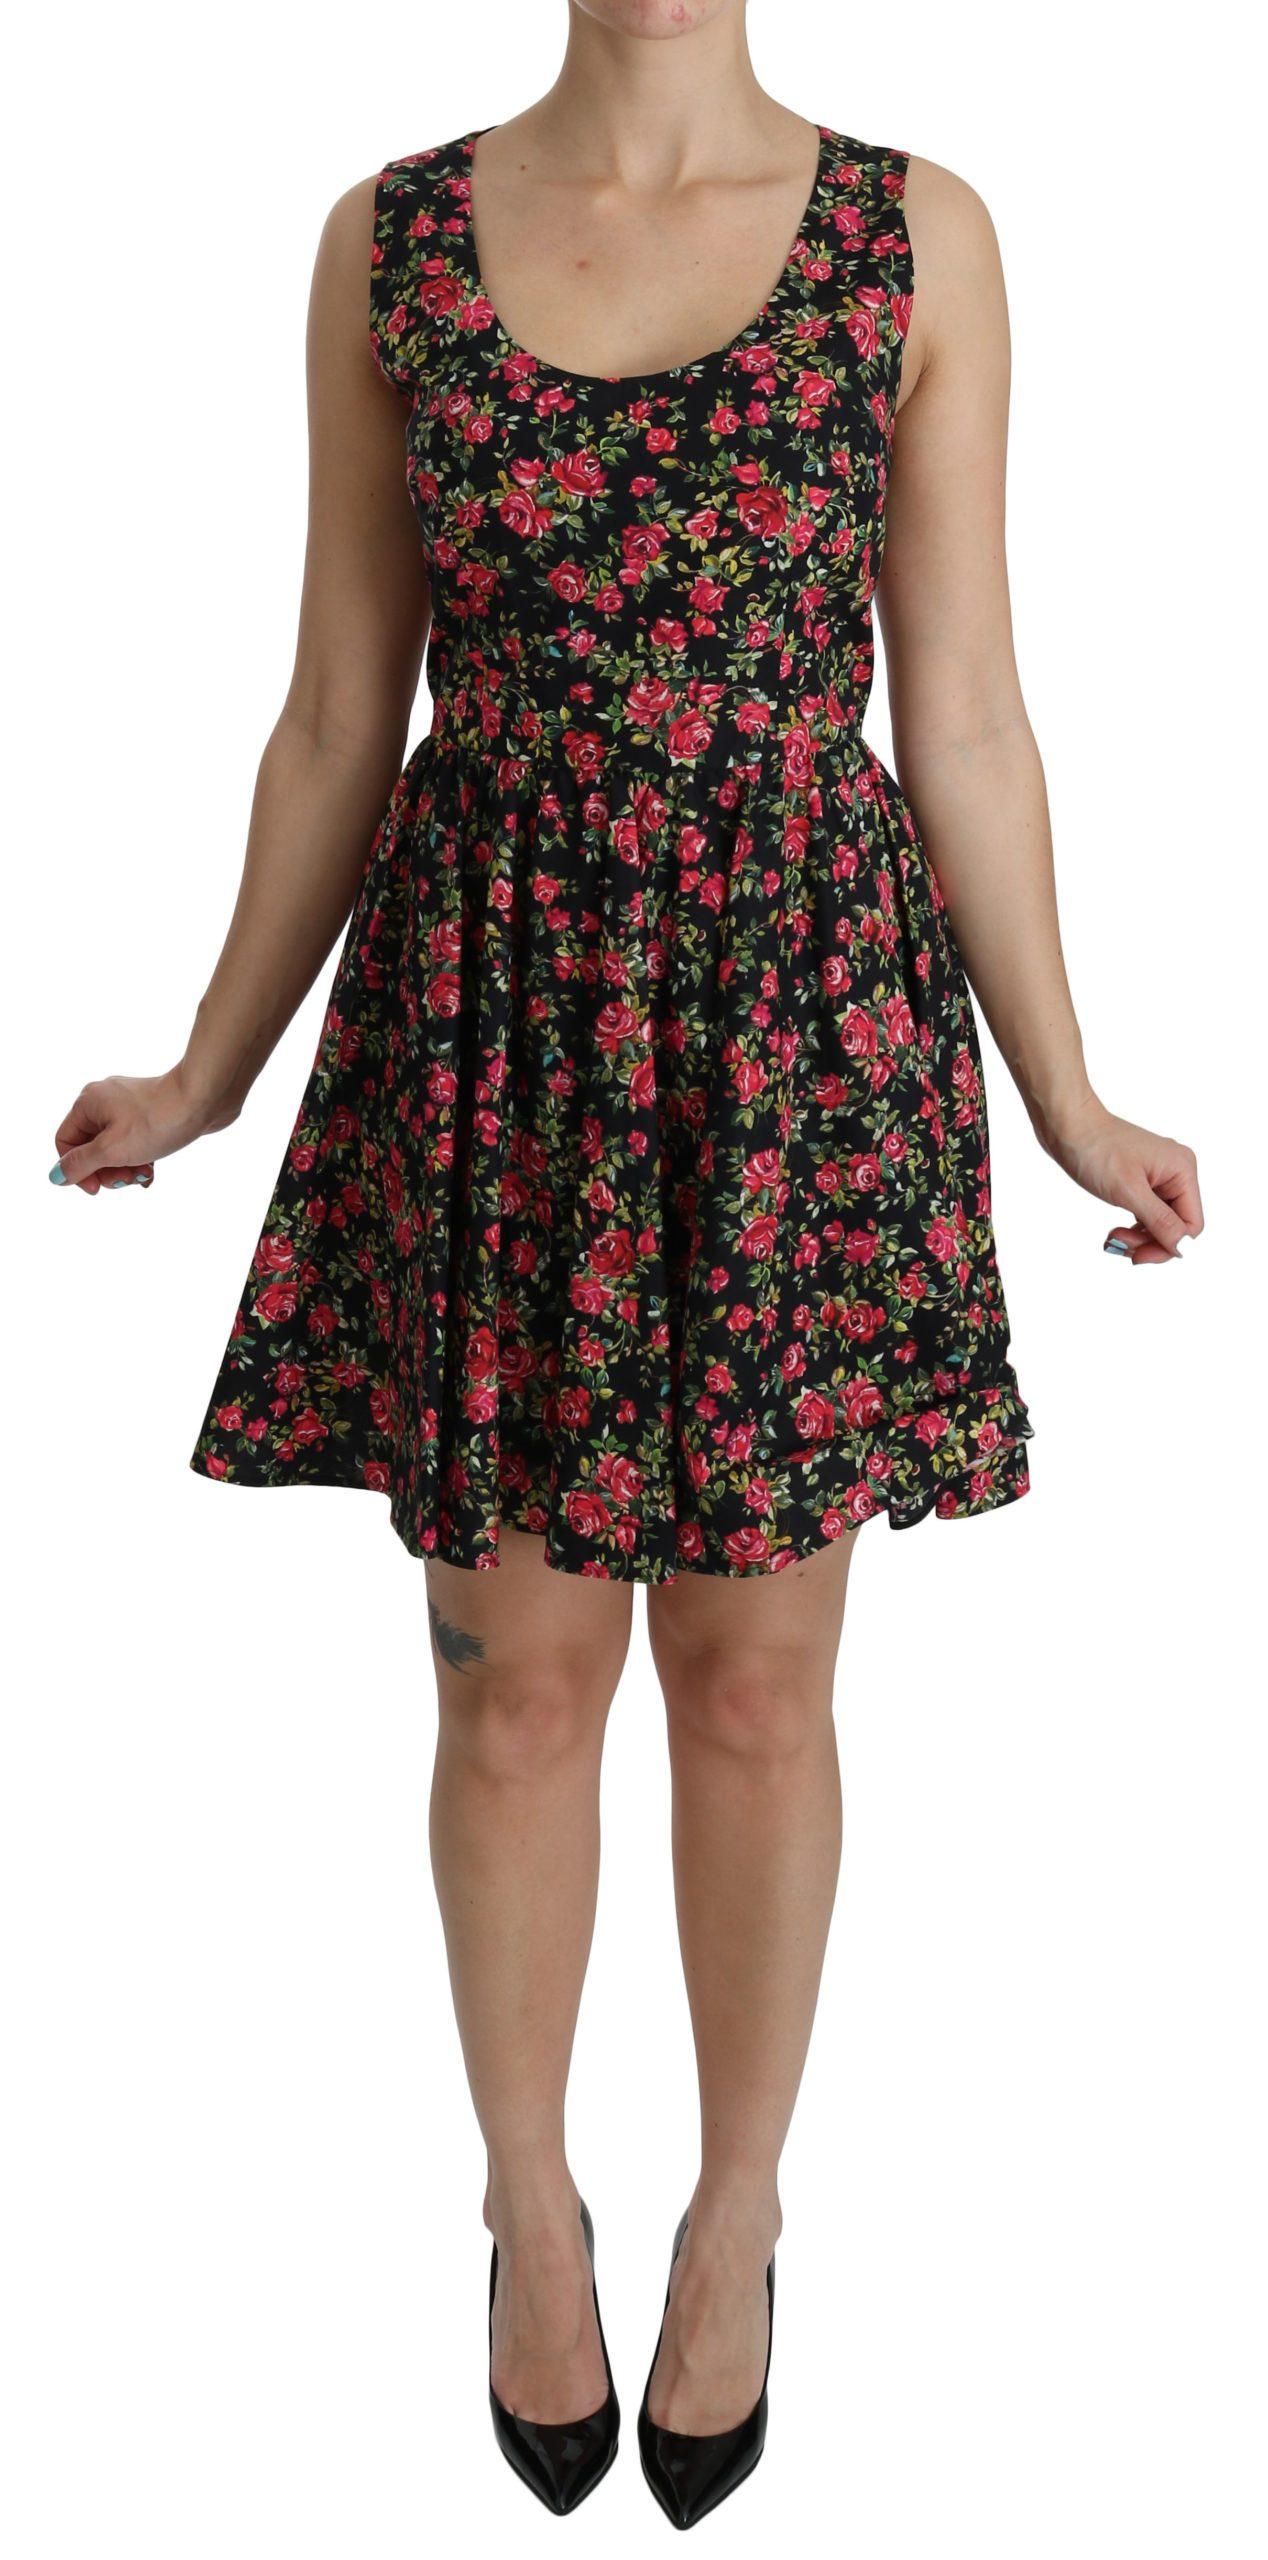 Dolce & Gabbana Women's Floral Sheath Sleeveless Mini Dress Black DR2092 - IT46|XL